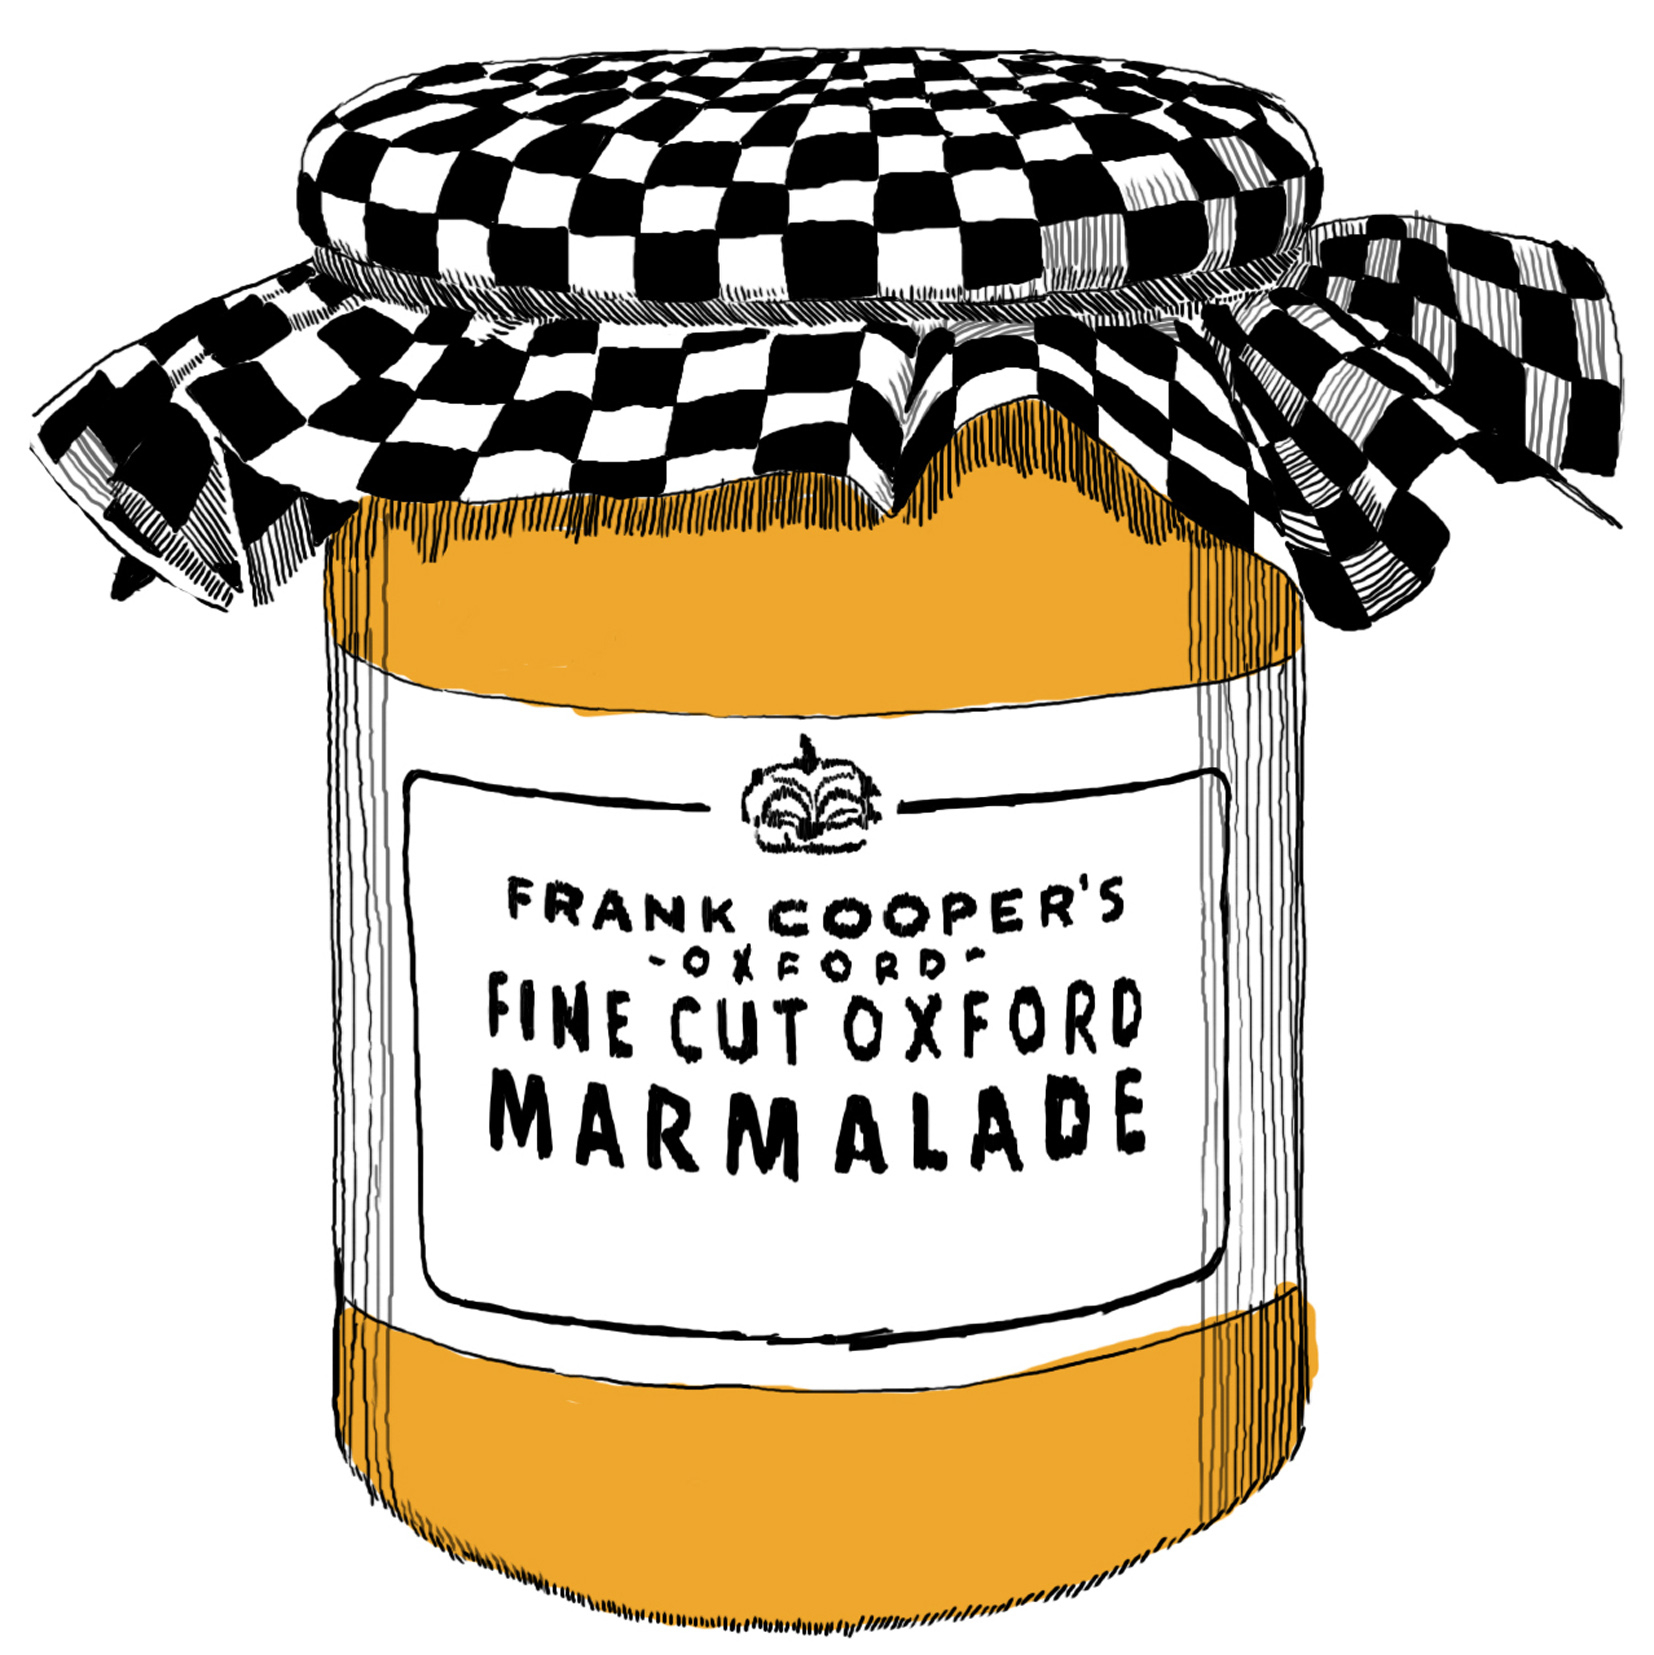 Fine Cut Oxford Marmalade